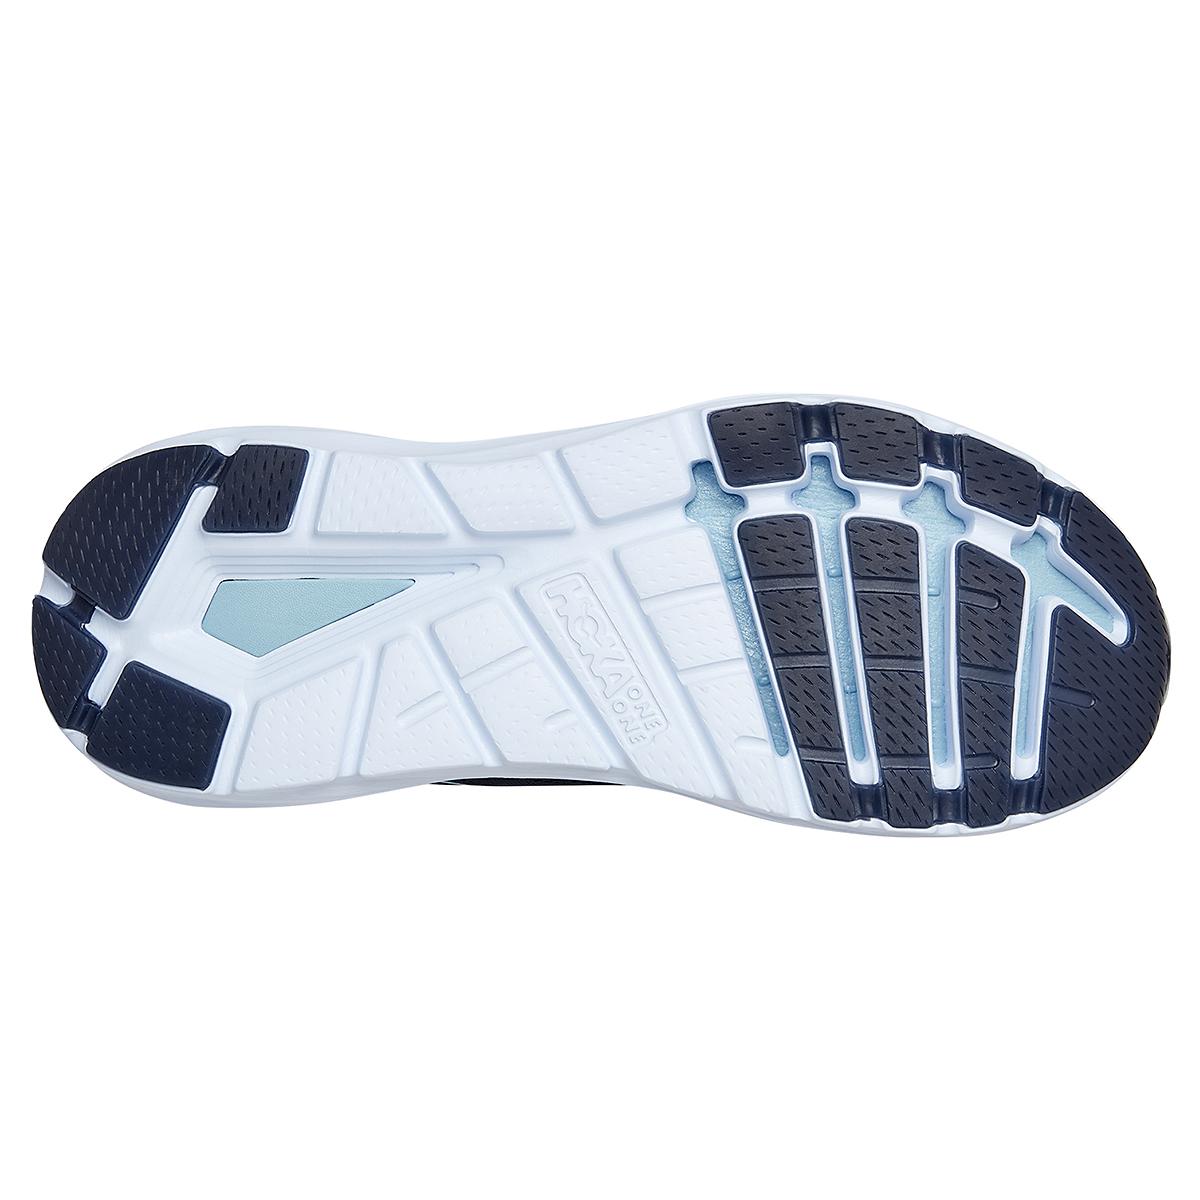 Men's Hoka One One Elevon 2 Running Shoe - Color: Ombre Blue - Size: 7 - Width: Regular, Ombre Blue, large, image 6